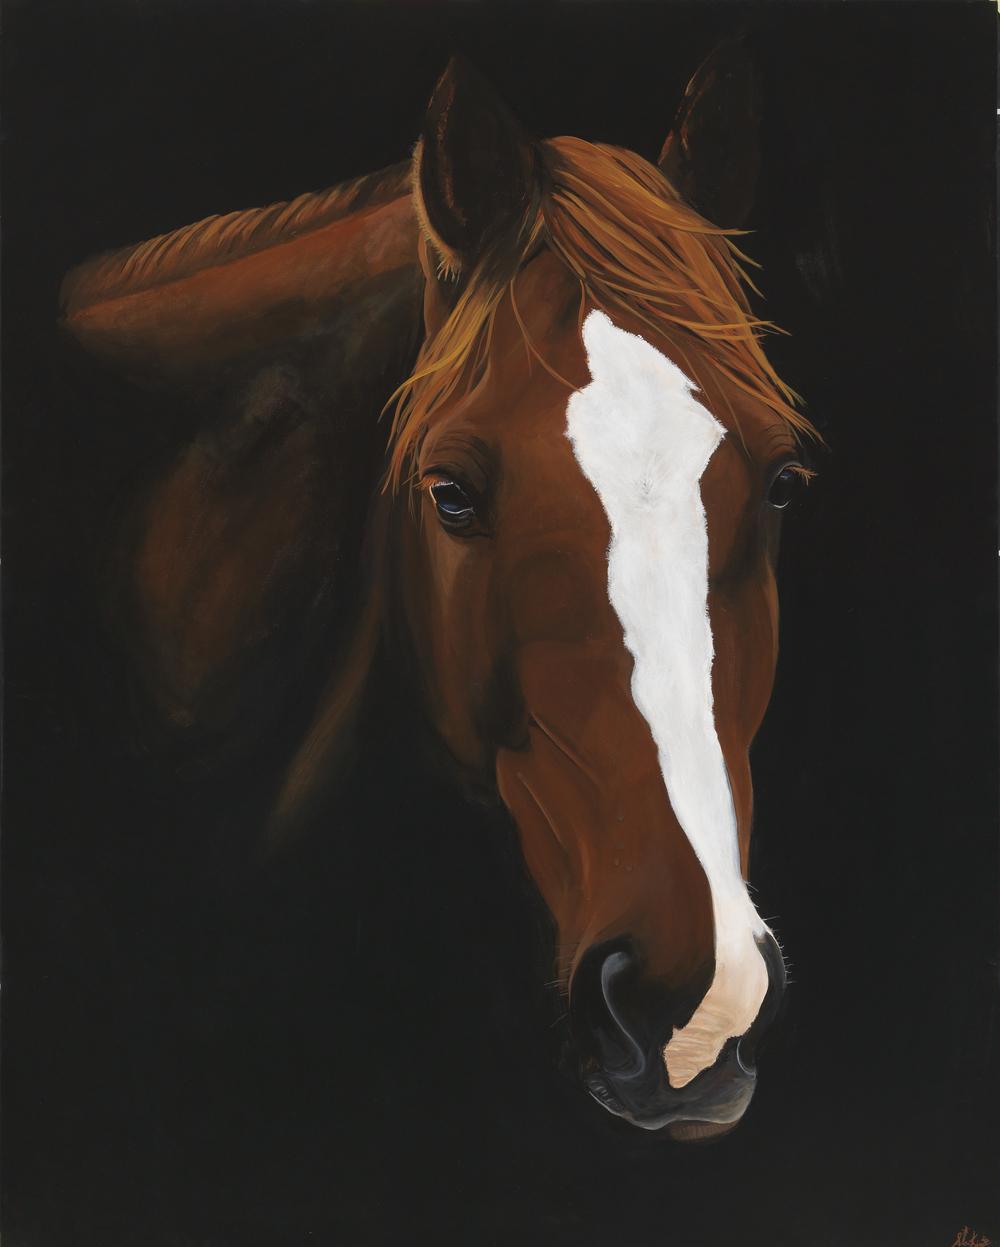 4ft x 5ft BAY ON BLACK  Acrylic on canvas.